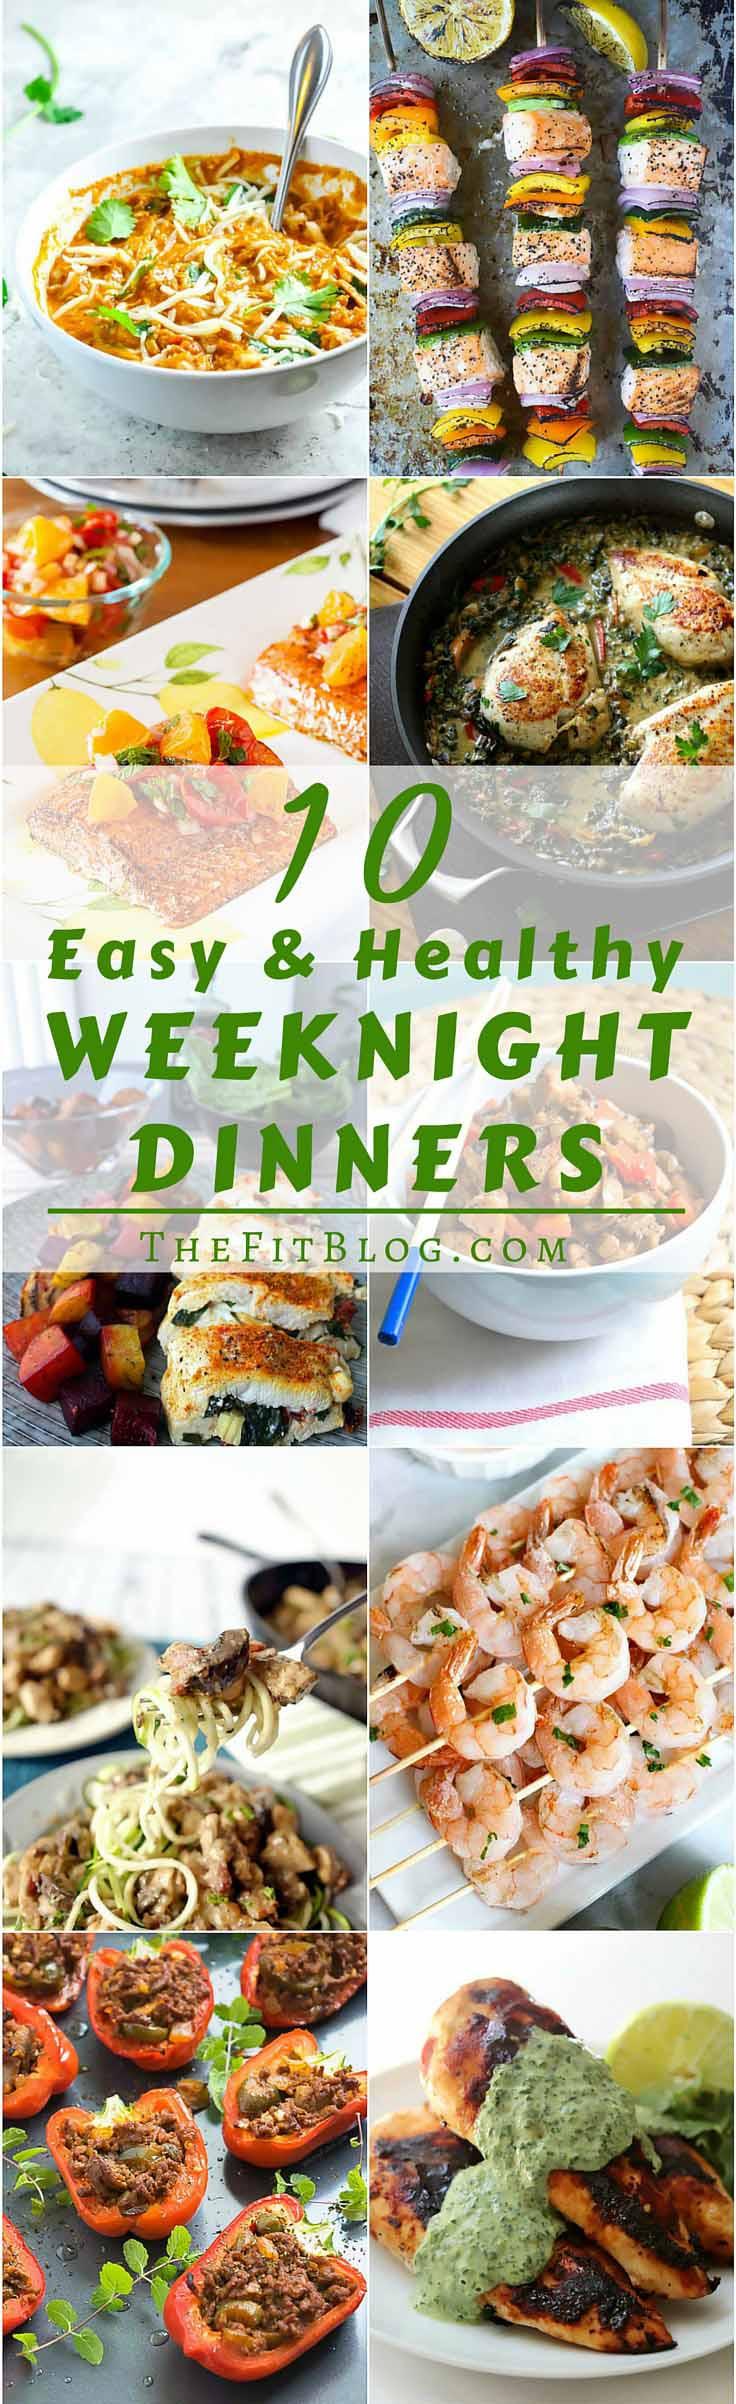 Easy Healthy Weeknight Dinners  10 Healthy and Easy Weeknight Dinners